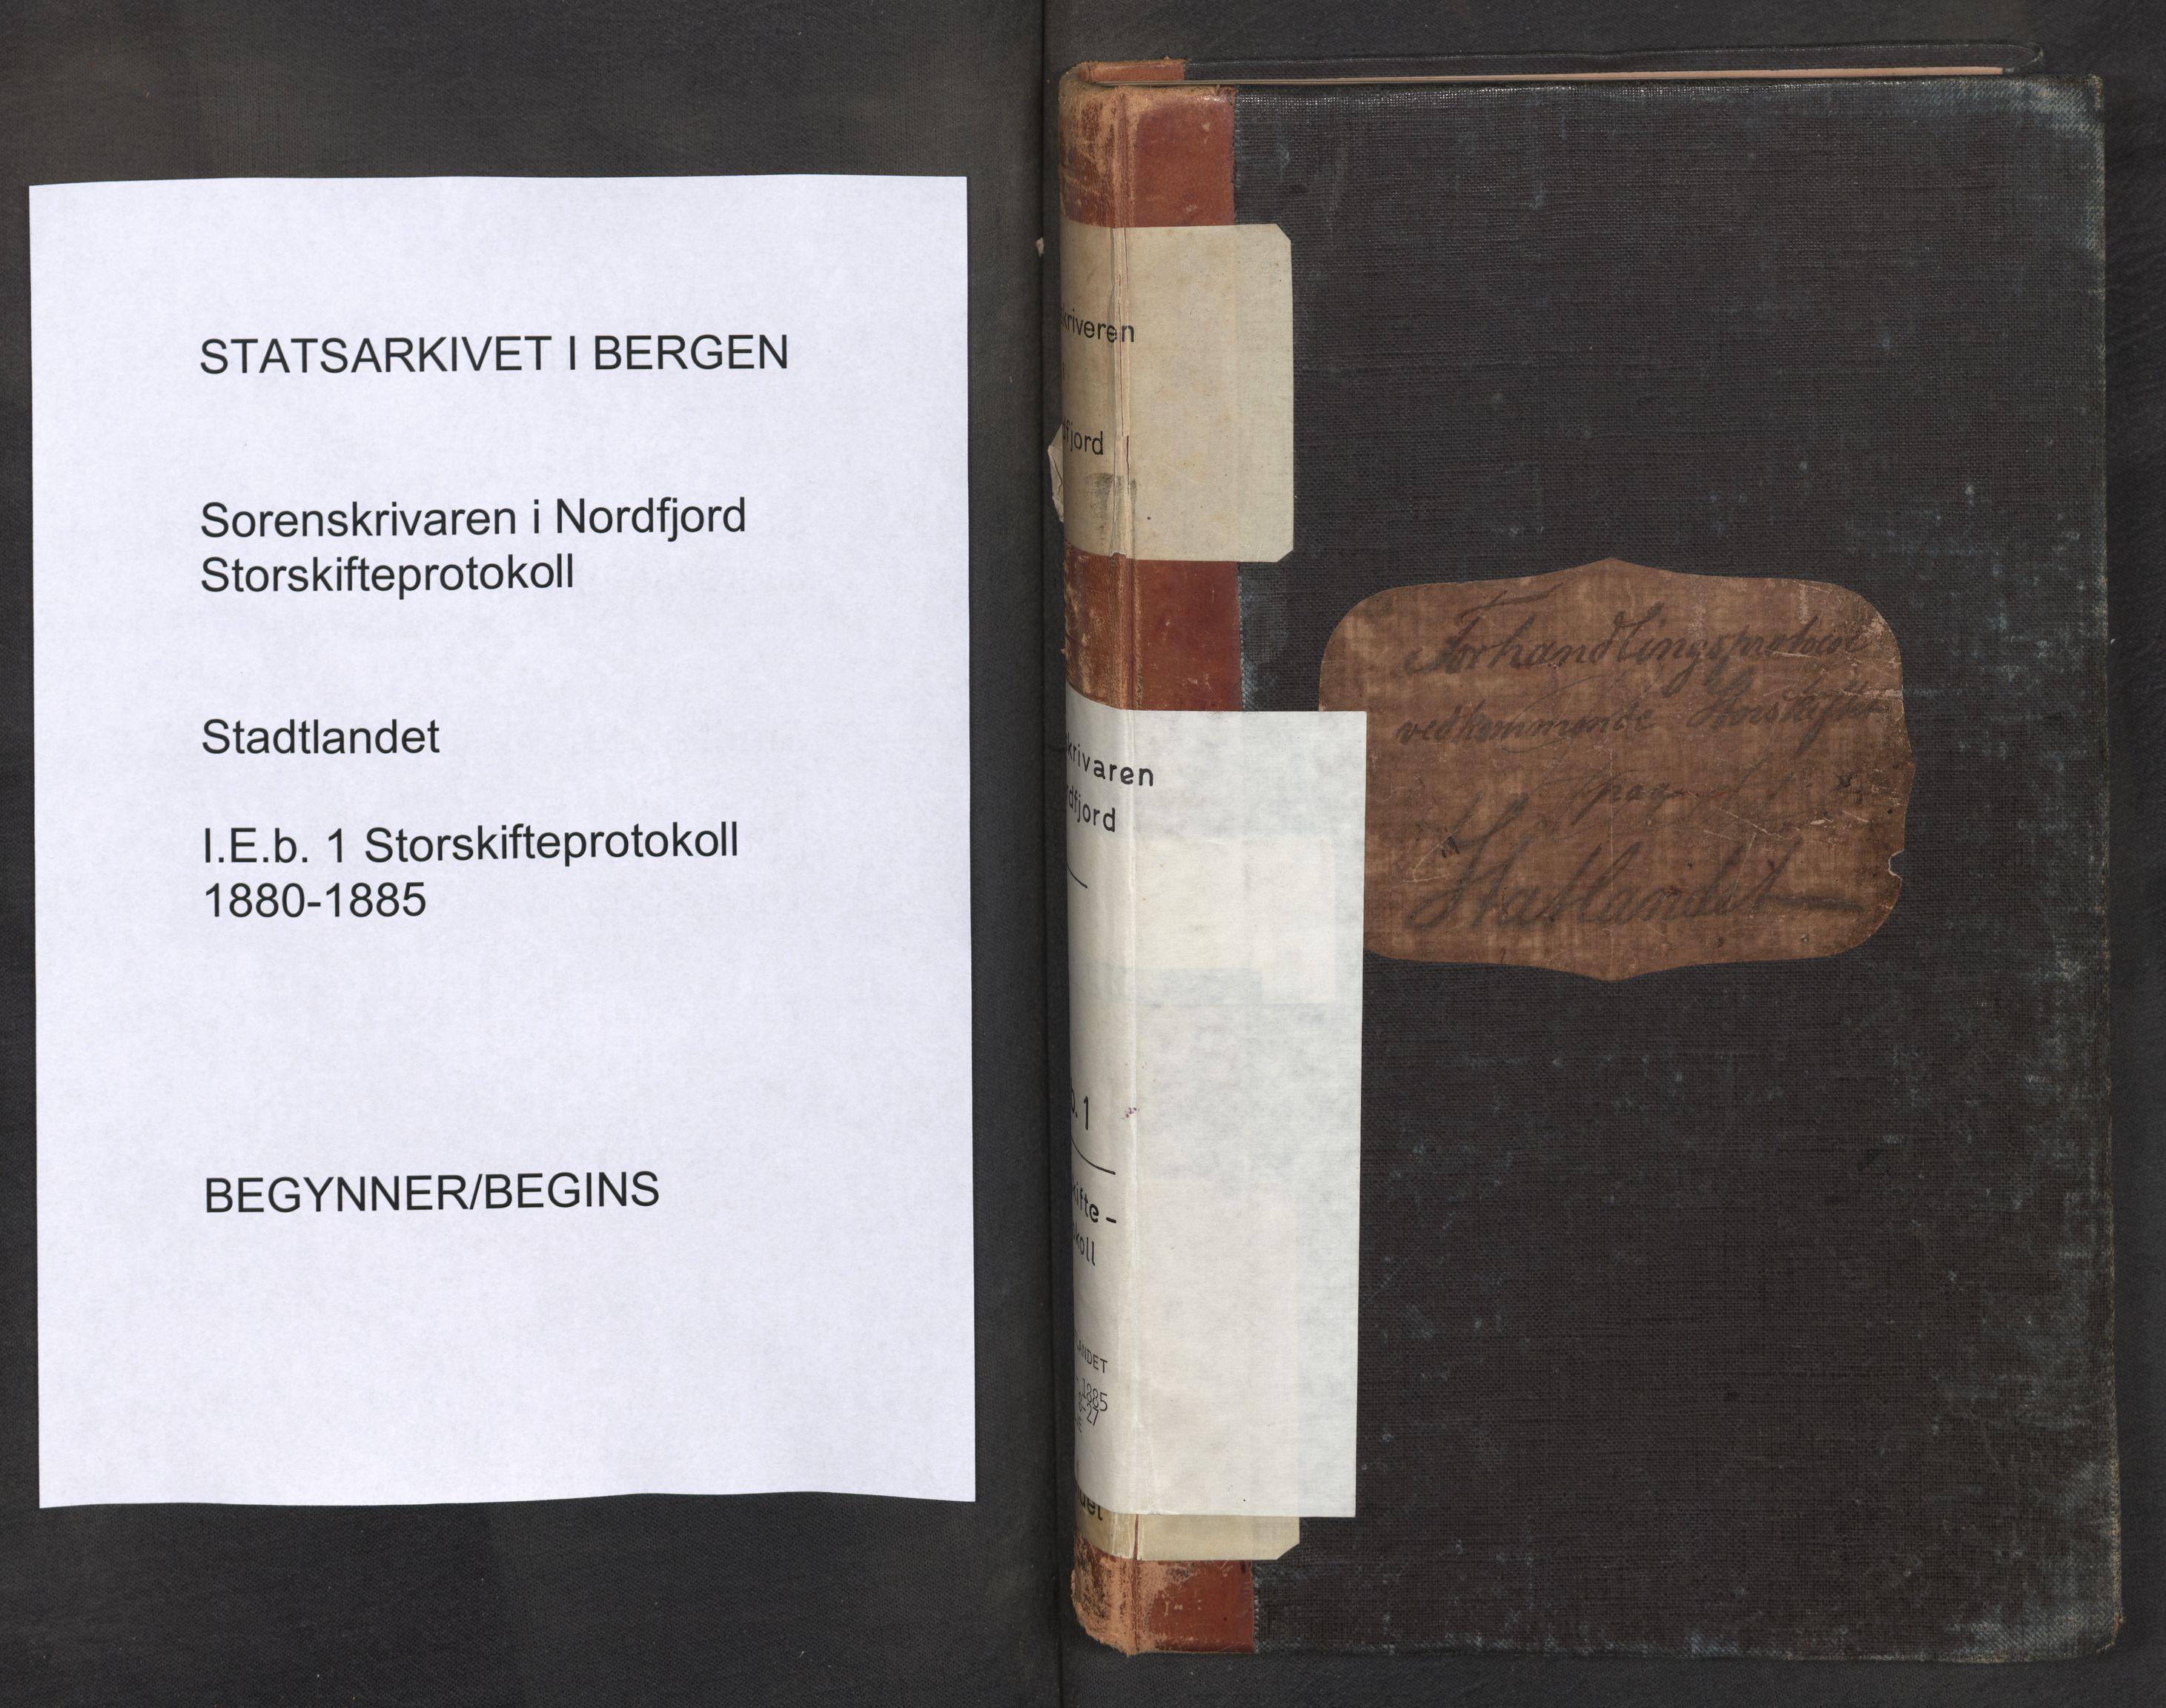 SAB, Nordfjord sorenskriveri, 01/01eb/L0001: Ekstrarettsprotokollar. Storskifte, 1880-1885